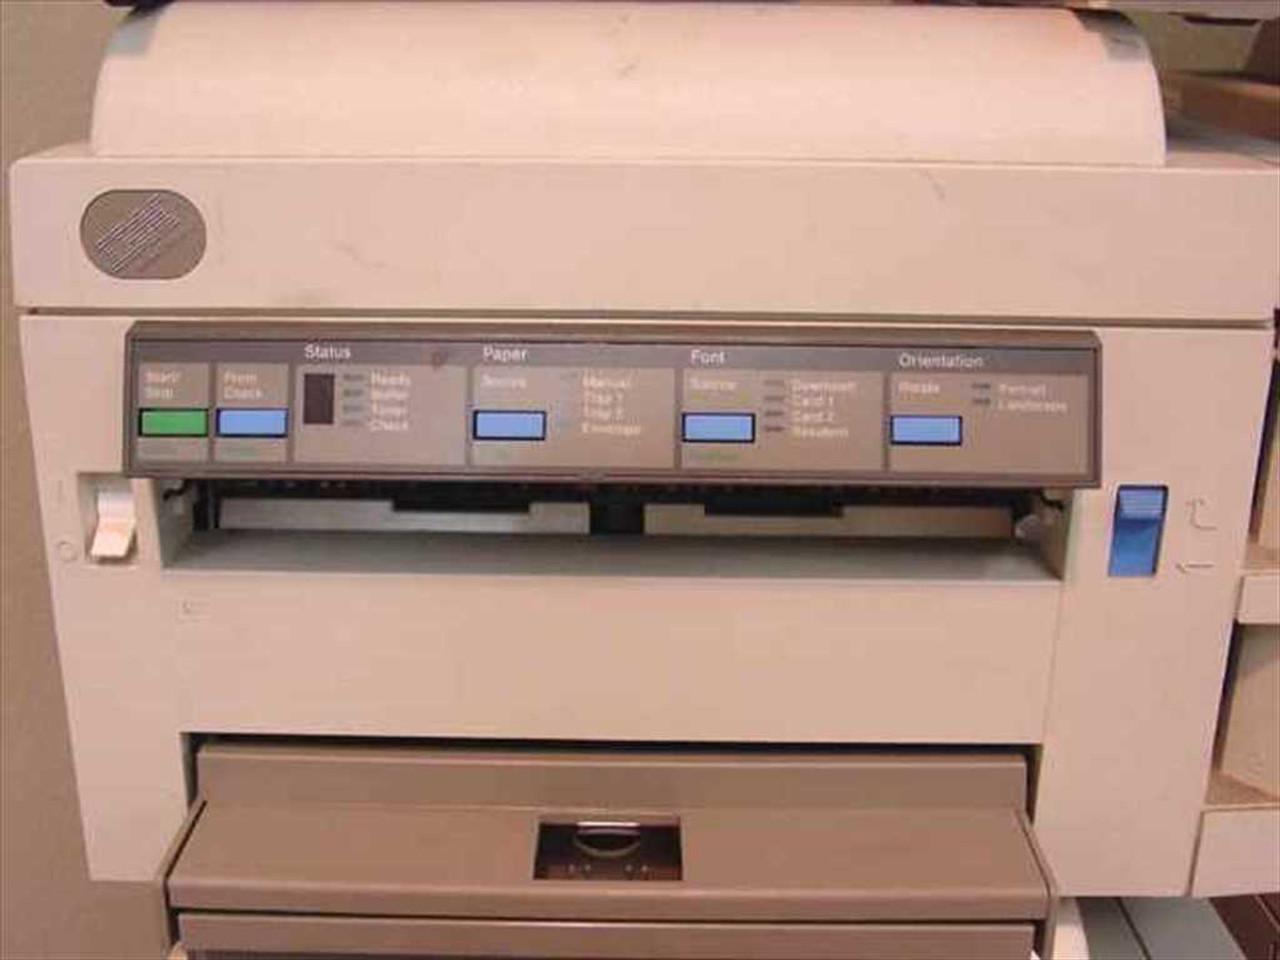 ... IBM 4029-020/4019-E01/4019 Lexmark Laser Printer 6 - Parts ...